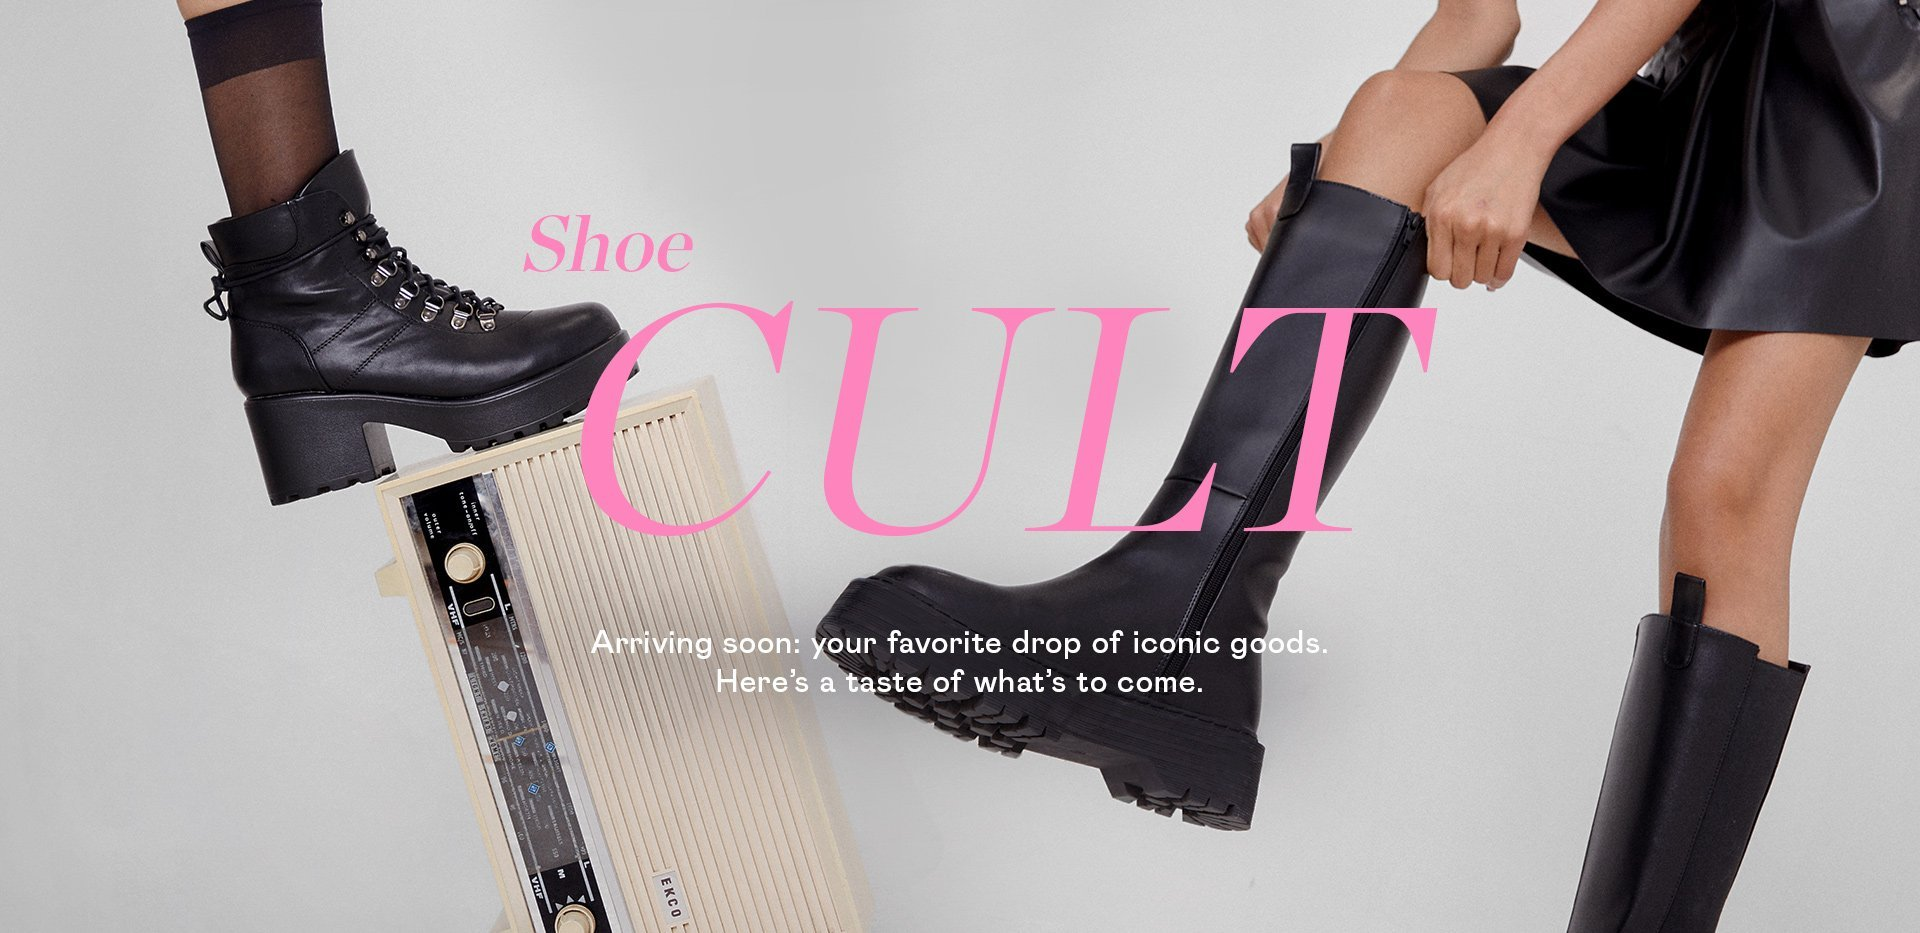 Shoe Cult